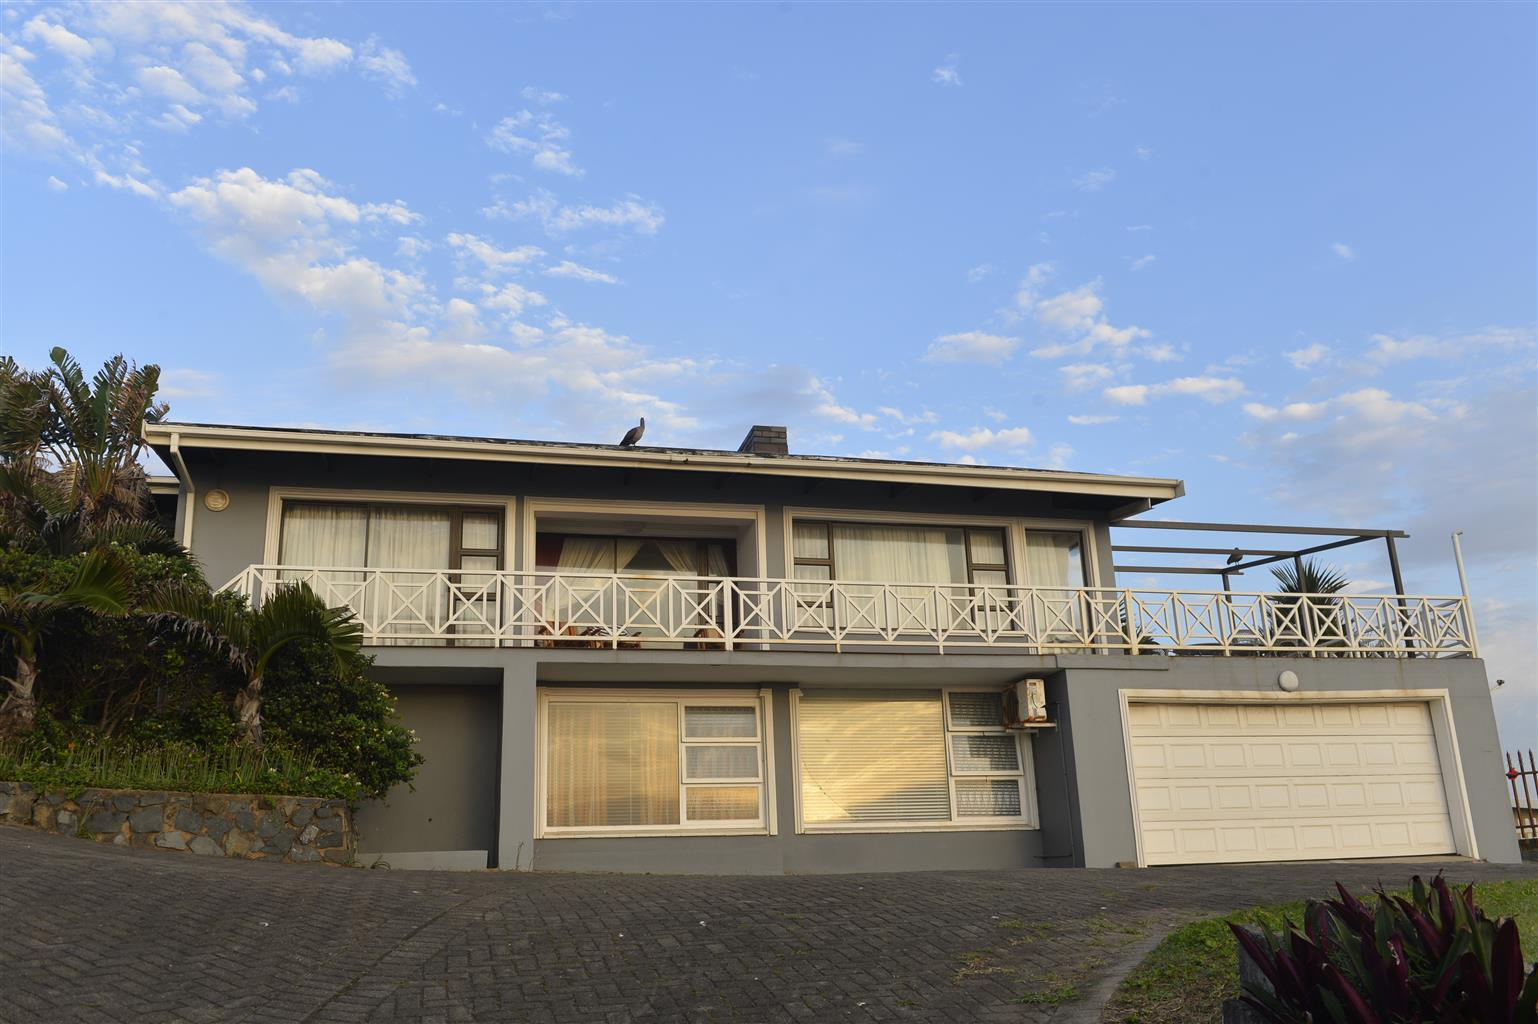 Sea Front House at Shelly Beach 180 degree sea views.